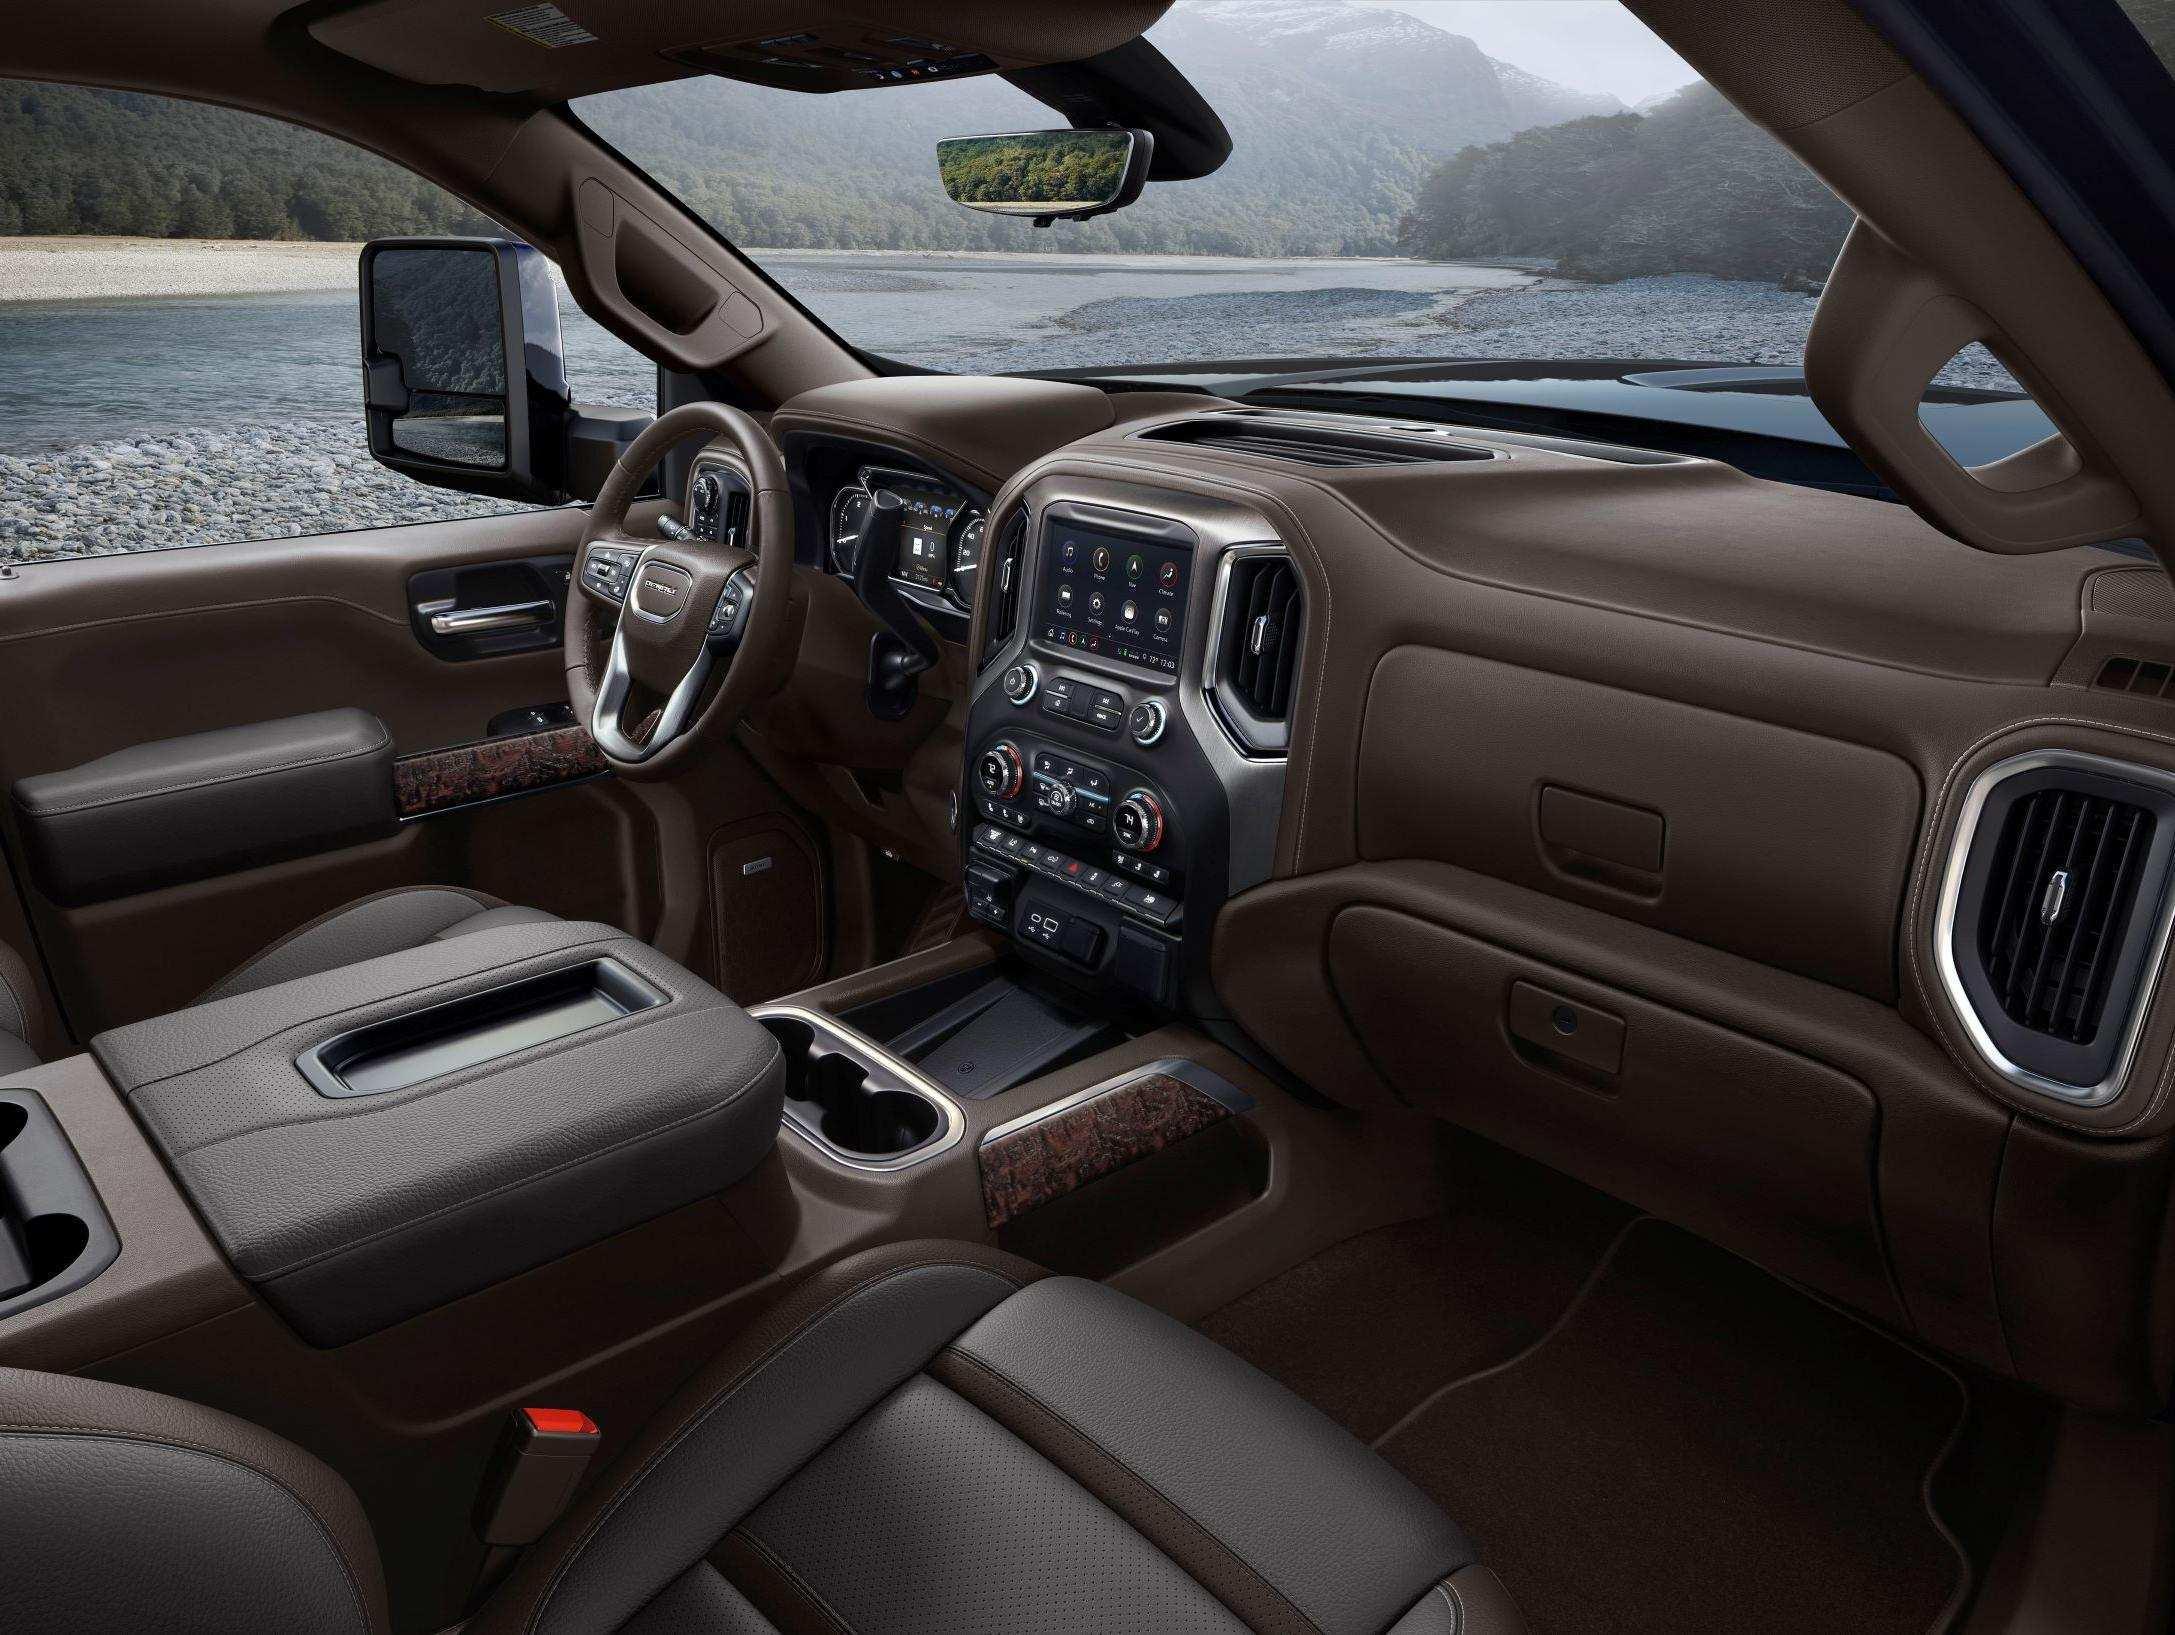 42 New 2020 Gmc Sierra Hd Interior Style by 2020 Gmc Sierra Hd Interior